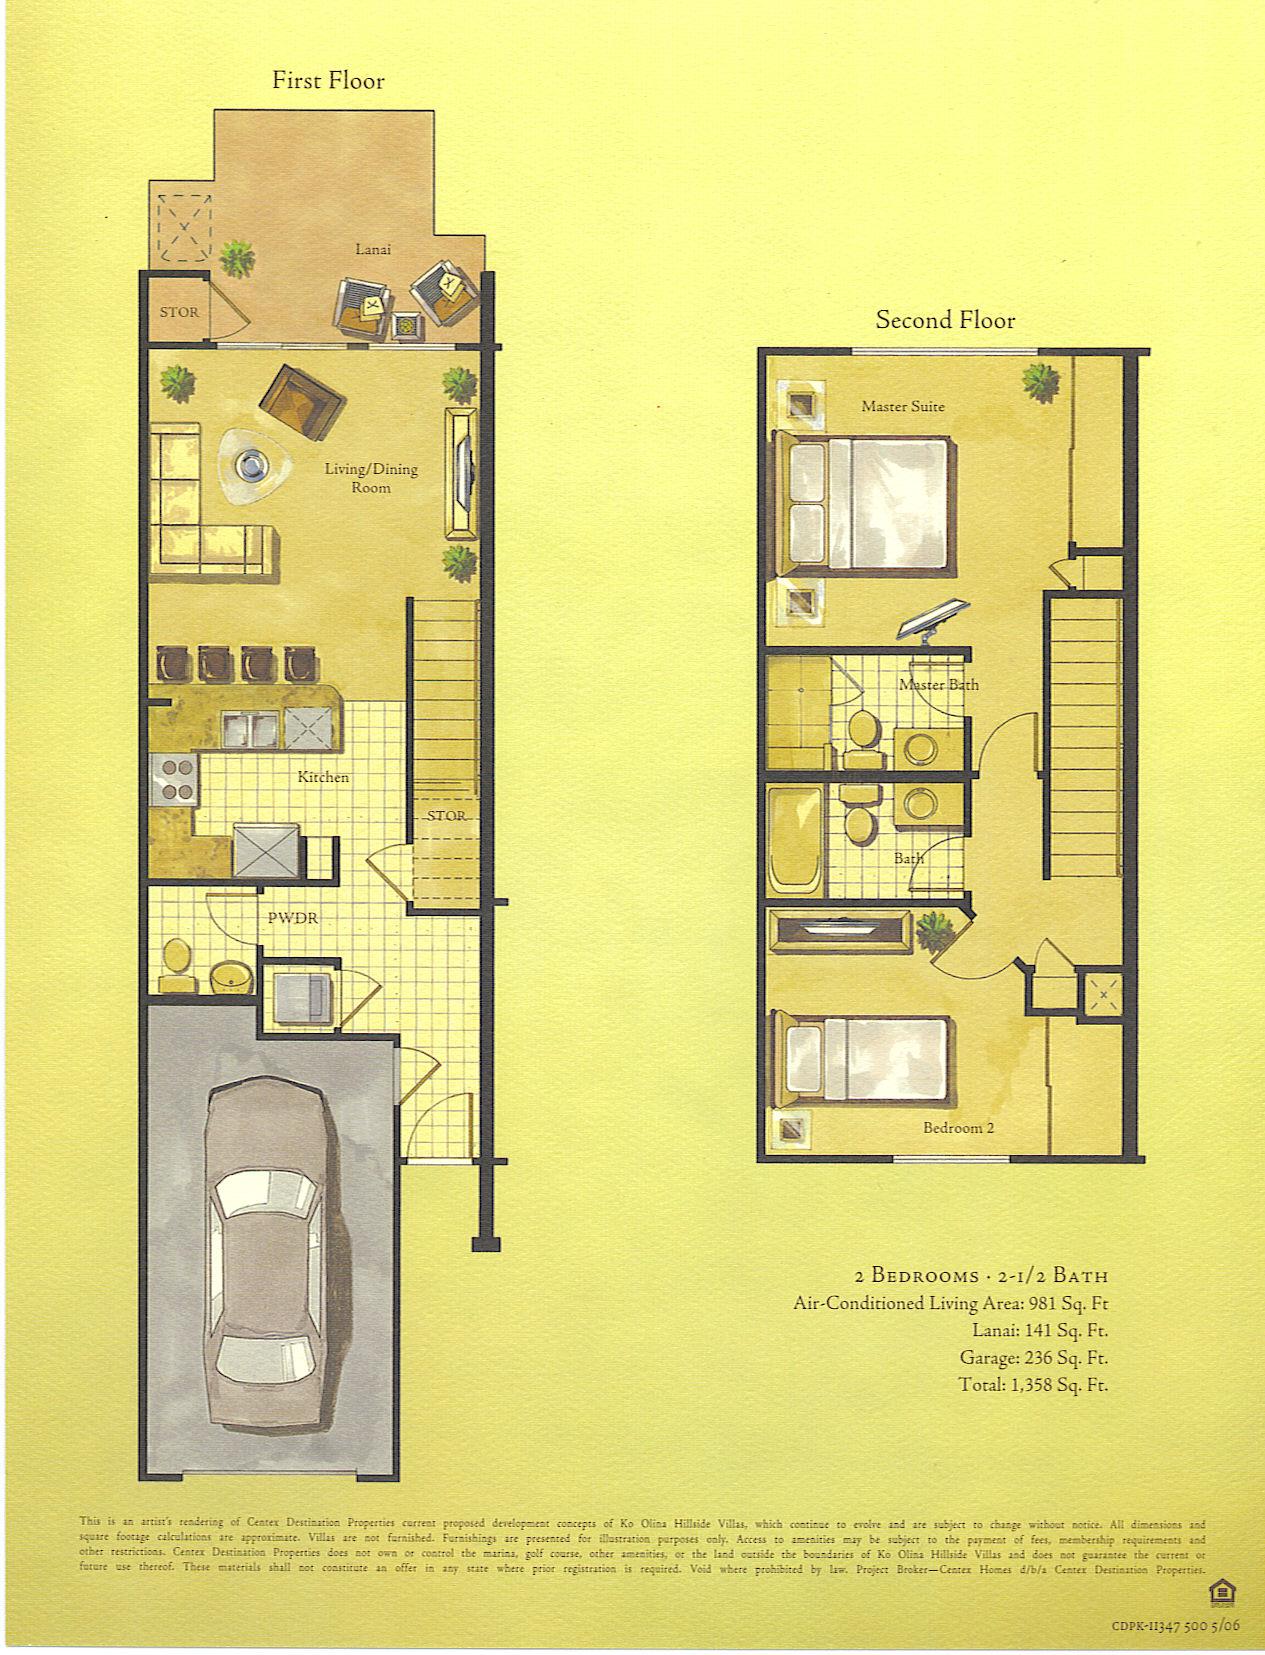 2 Bedroom - 2.5 Bath Living area - 981 sq. ft. Lanai - 141 sq. ft. Garage - 236 sq. ft. Total - 1,358 sq. ft.